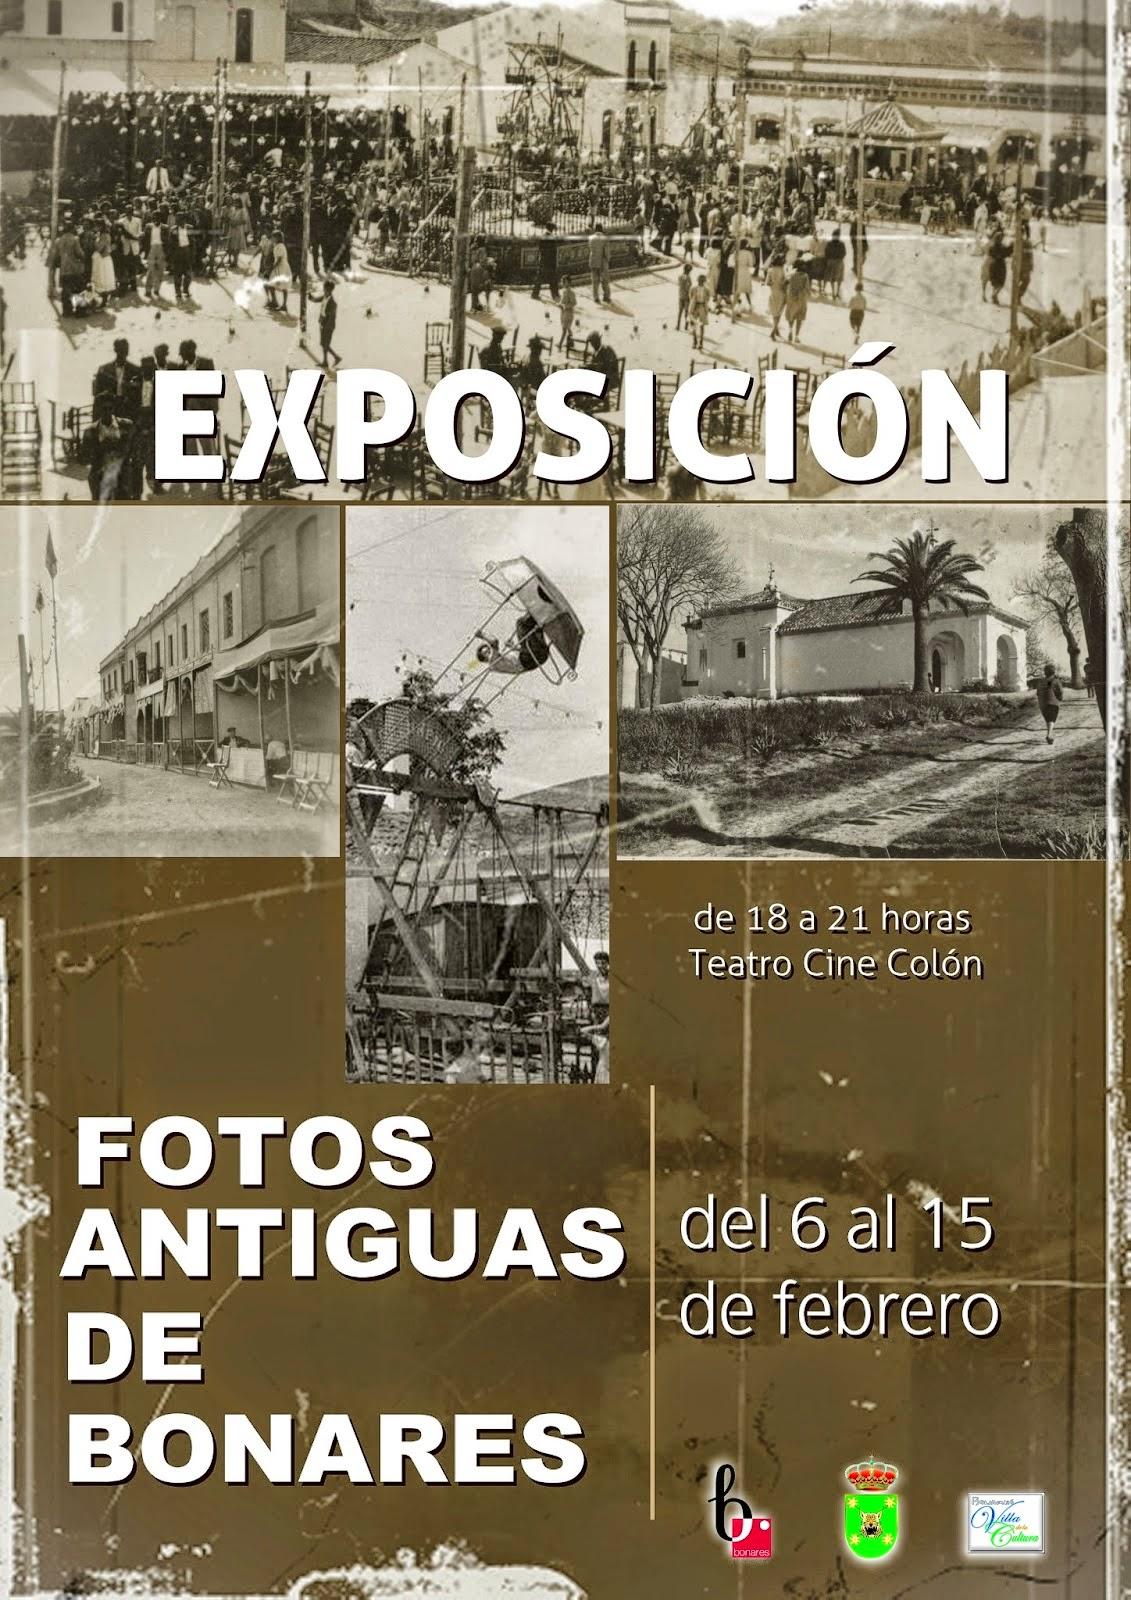 FOTOS ANTIGUAS DE BONARES